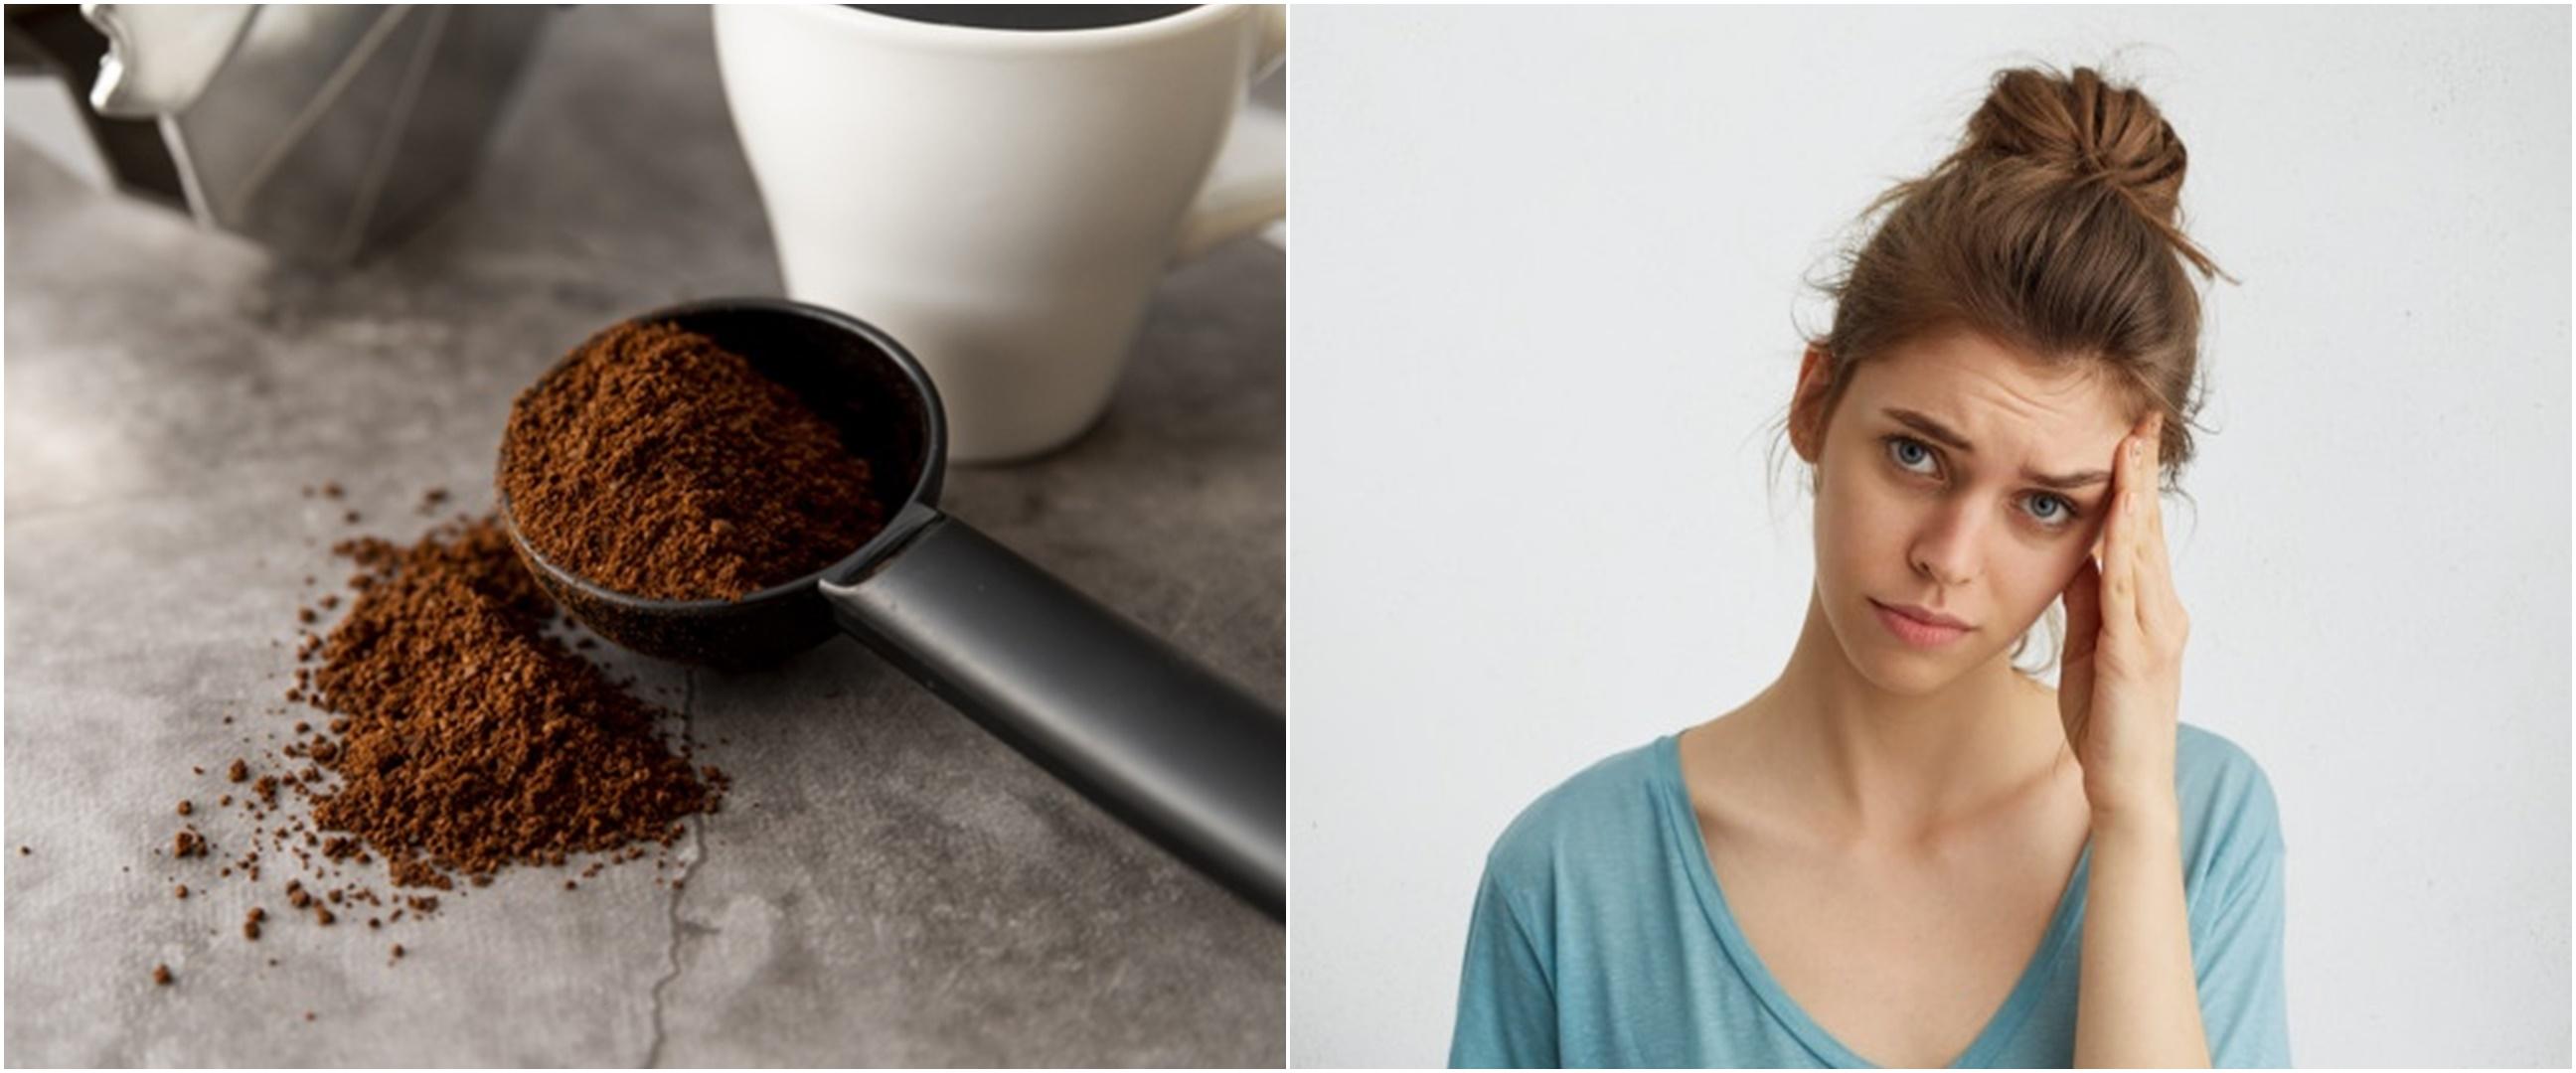 5 Cara membuat masker kopi untuk hilangkan mata panda, aman dan ampuh